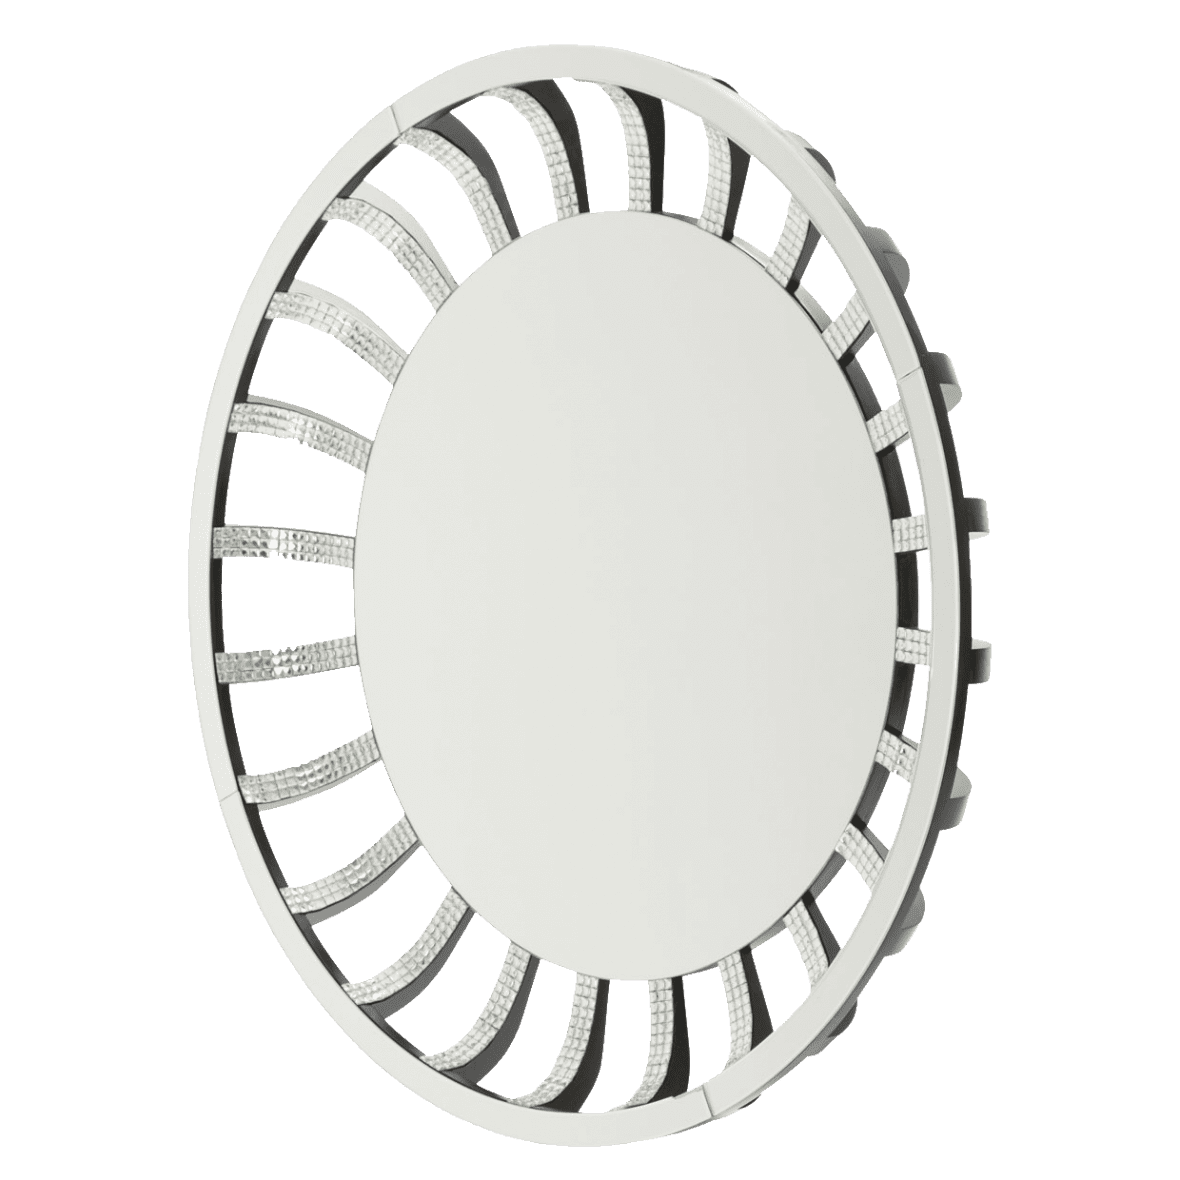 Зеркало круглое, Ар Деко, Лучи Солнца